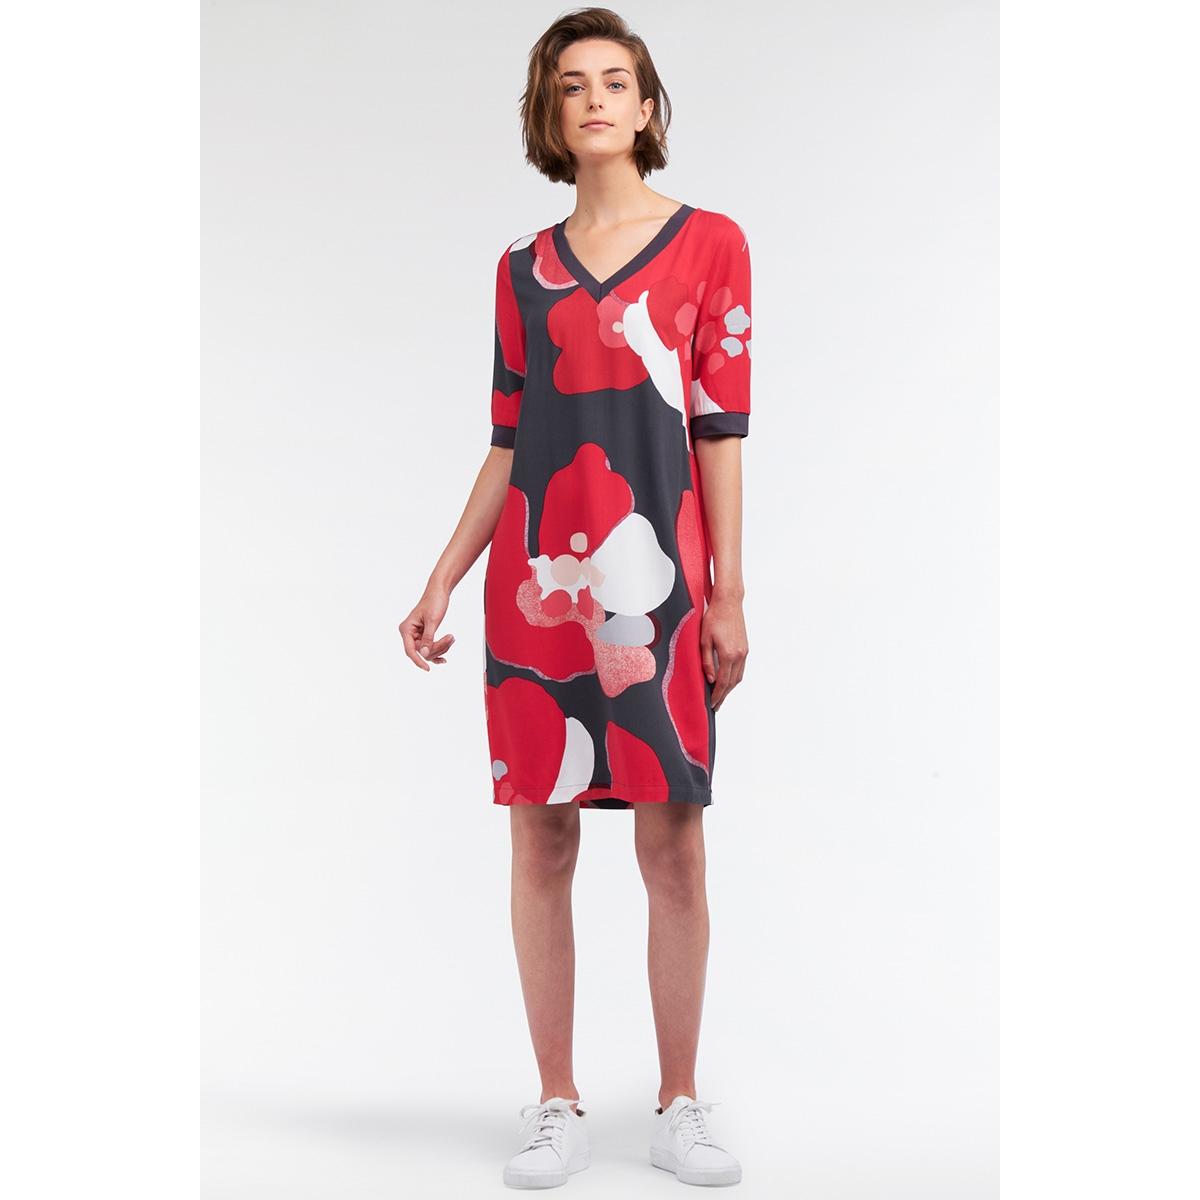 jurk met bloemenprint 23001601 sandwich jurk 20147